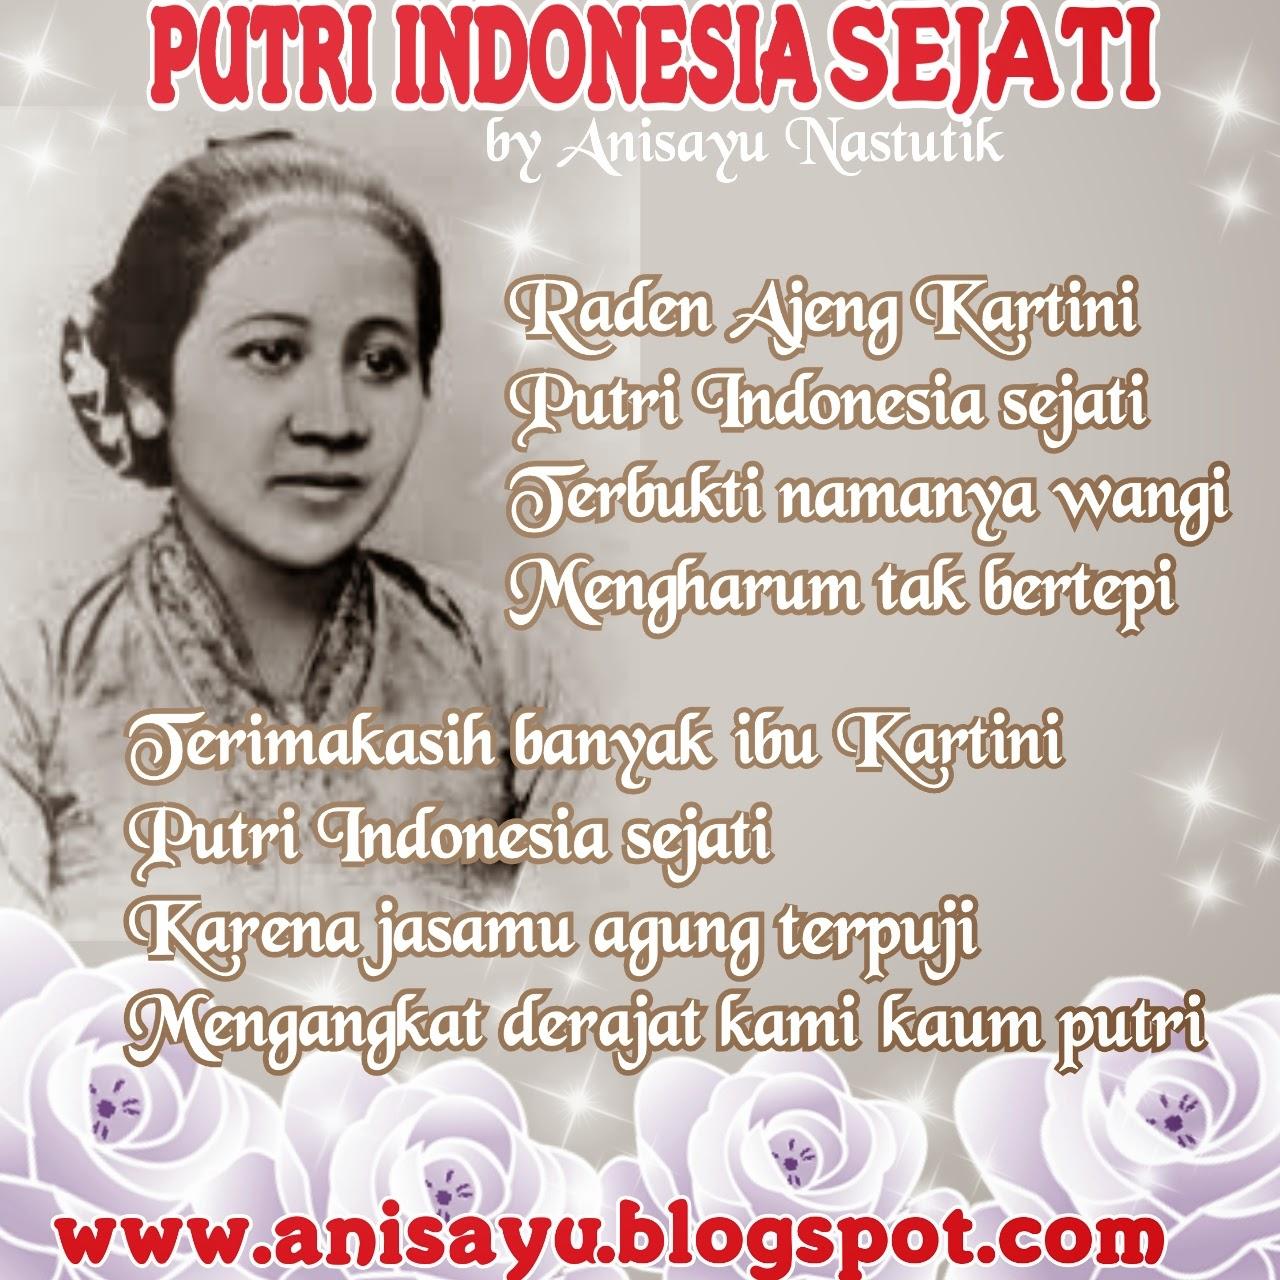 11 Contoh Puisi Kartini Terlengkap Sangat Inspiratif